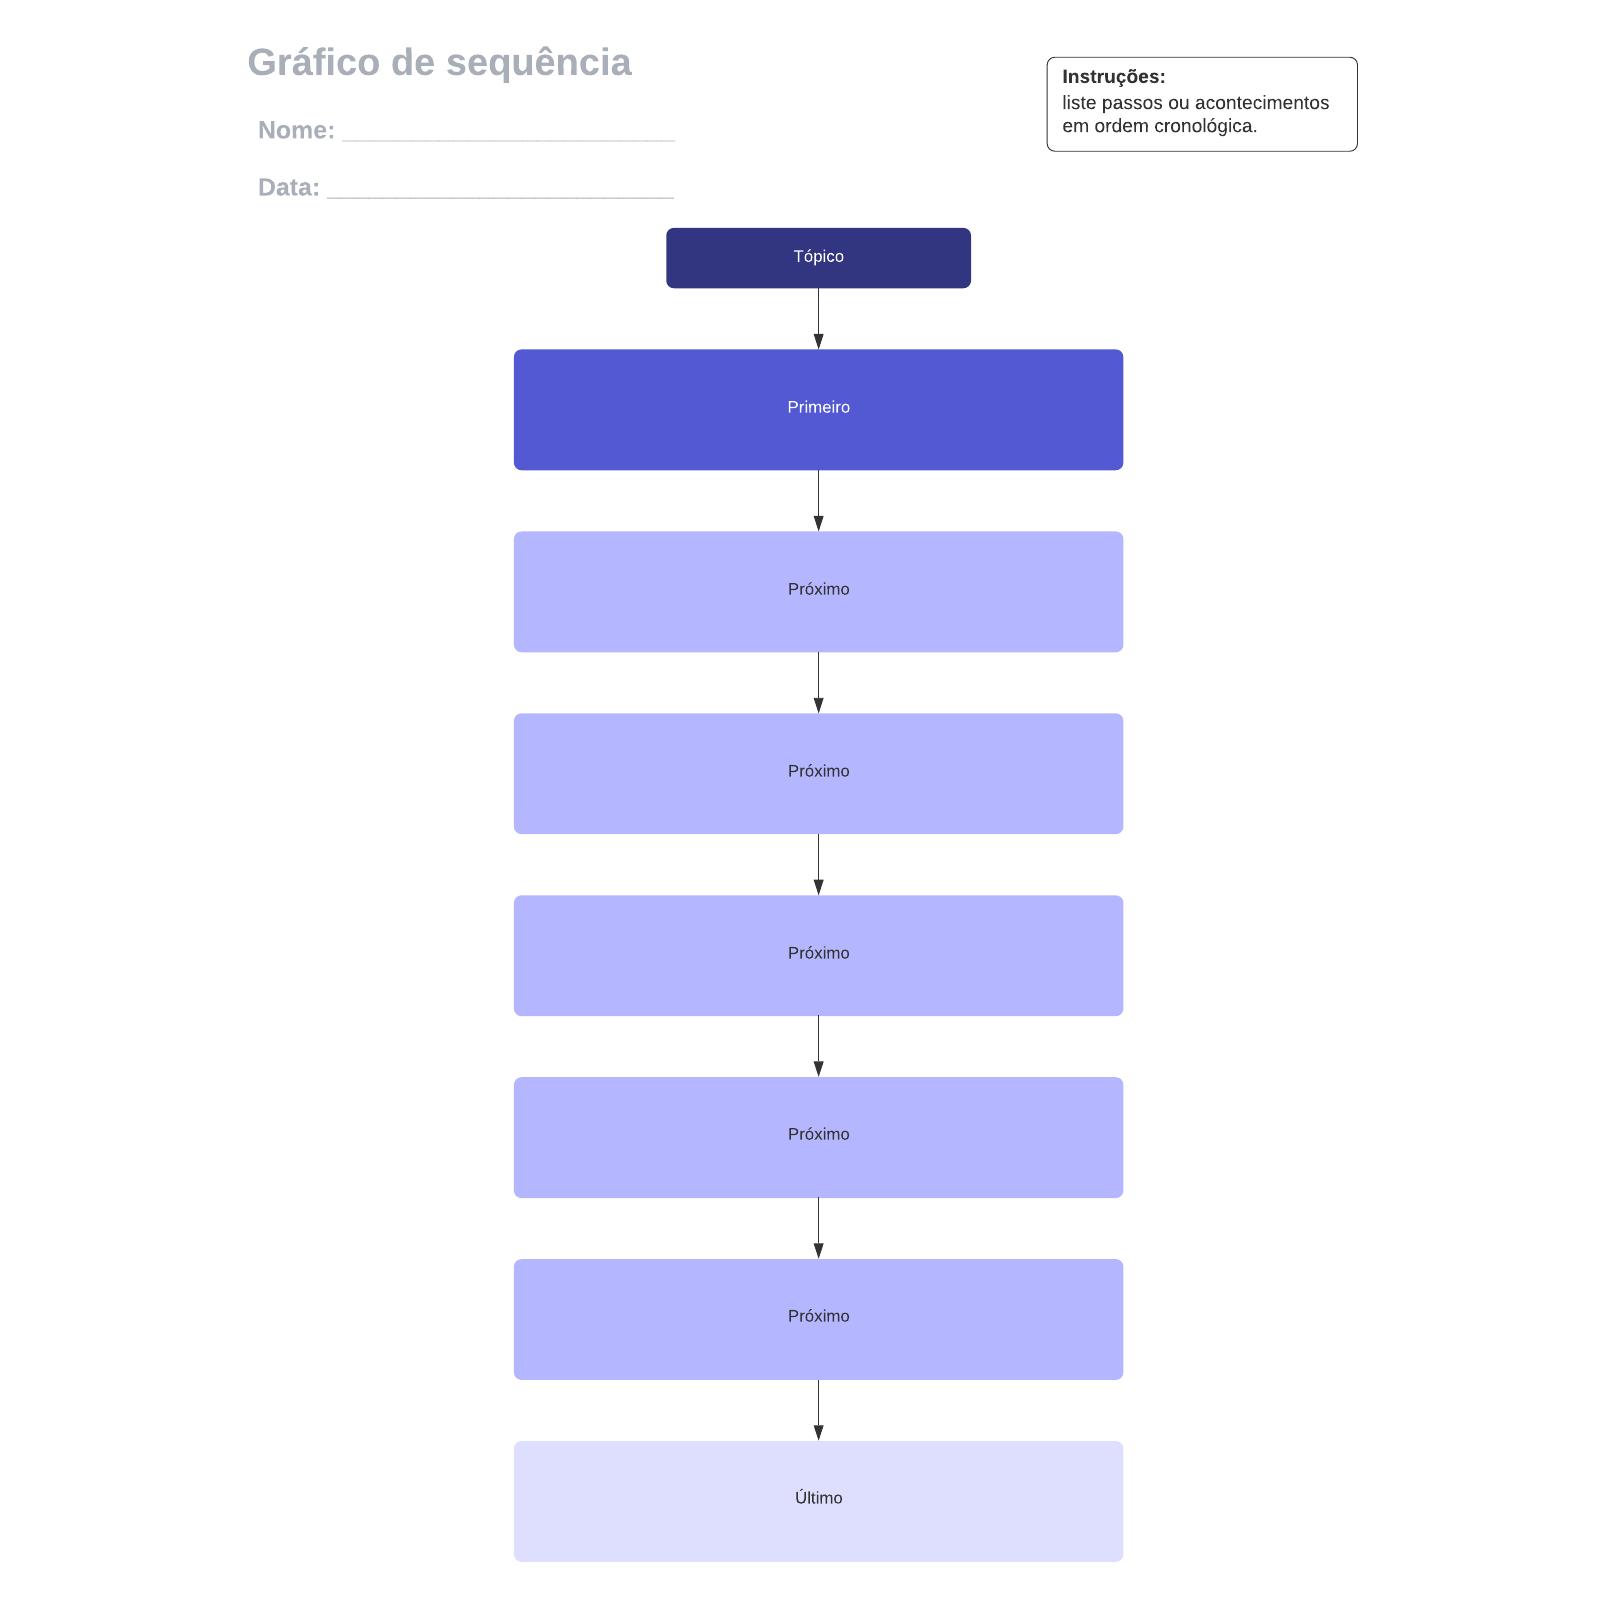 Gráfico de sequência